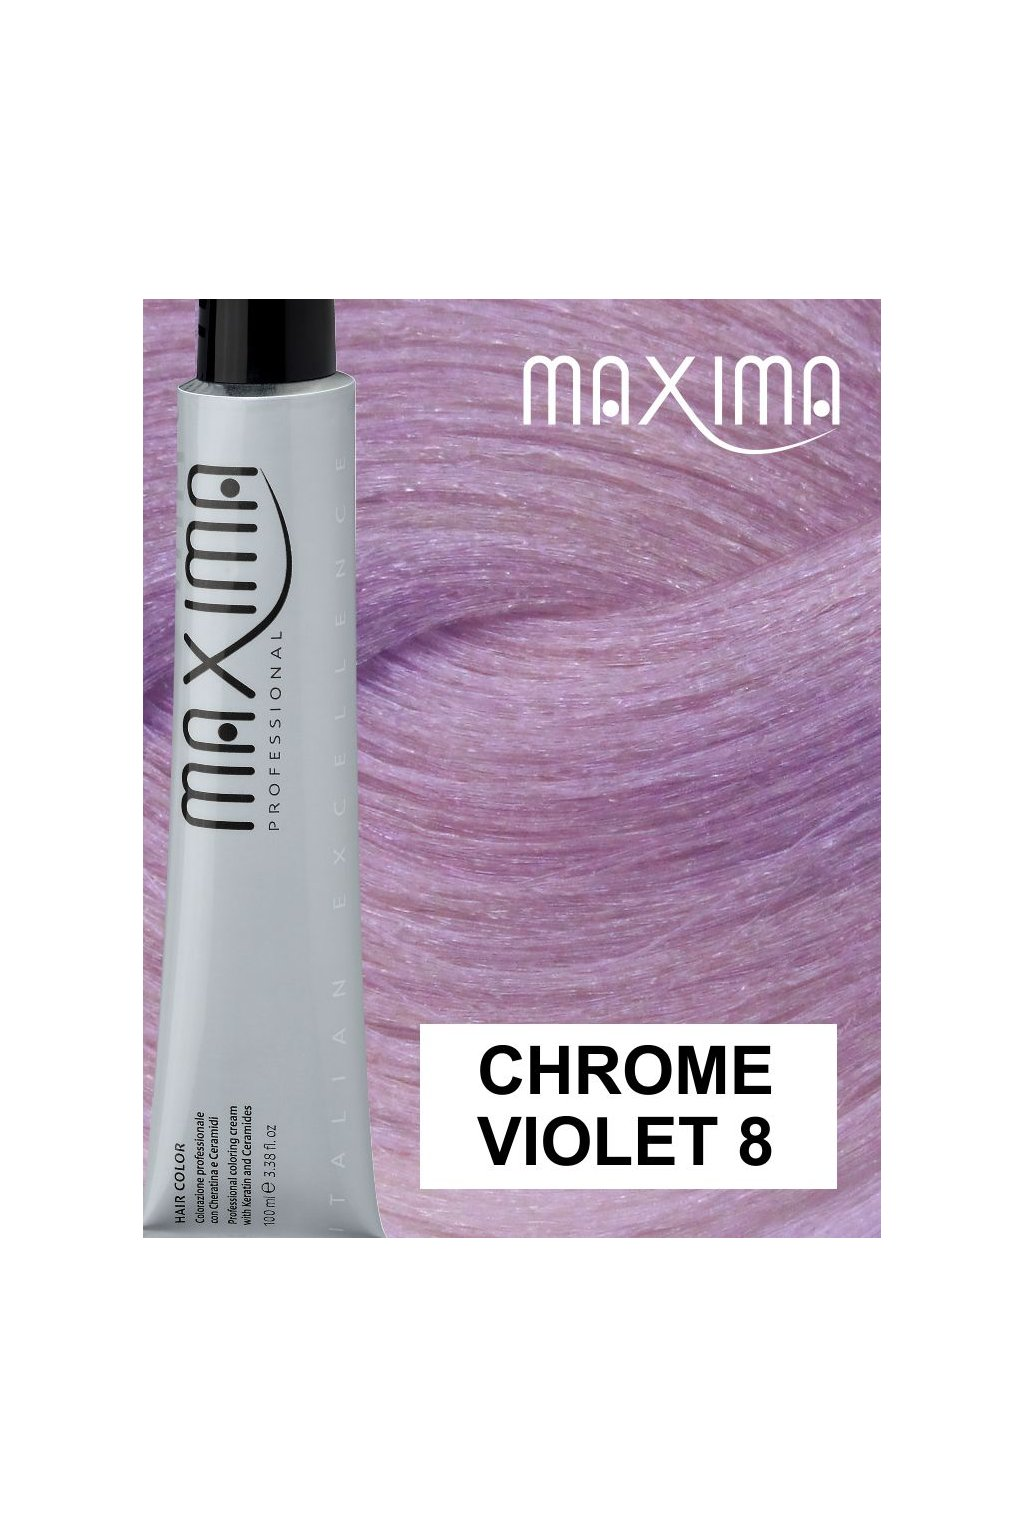 CHROME VIOLET 8 max